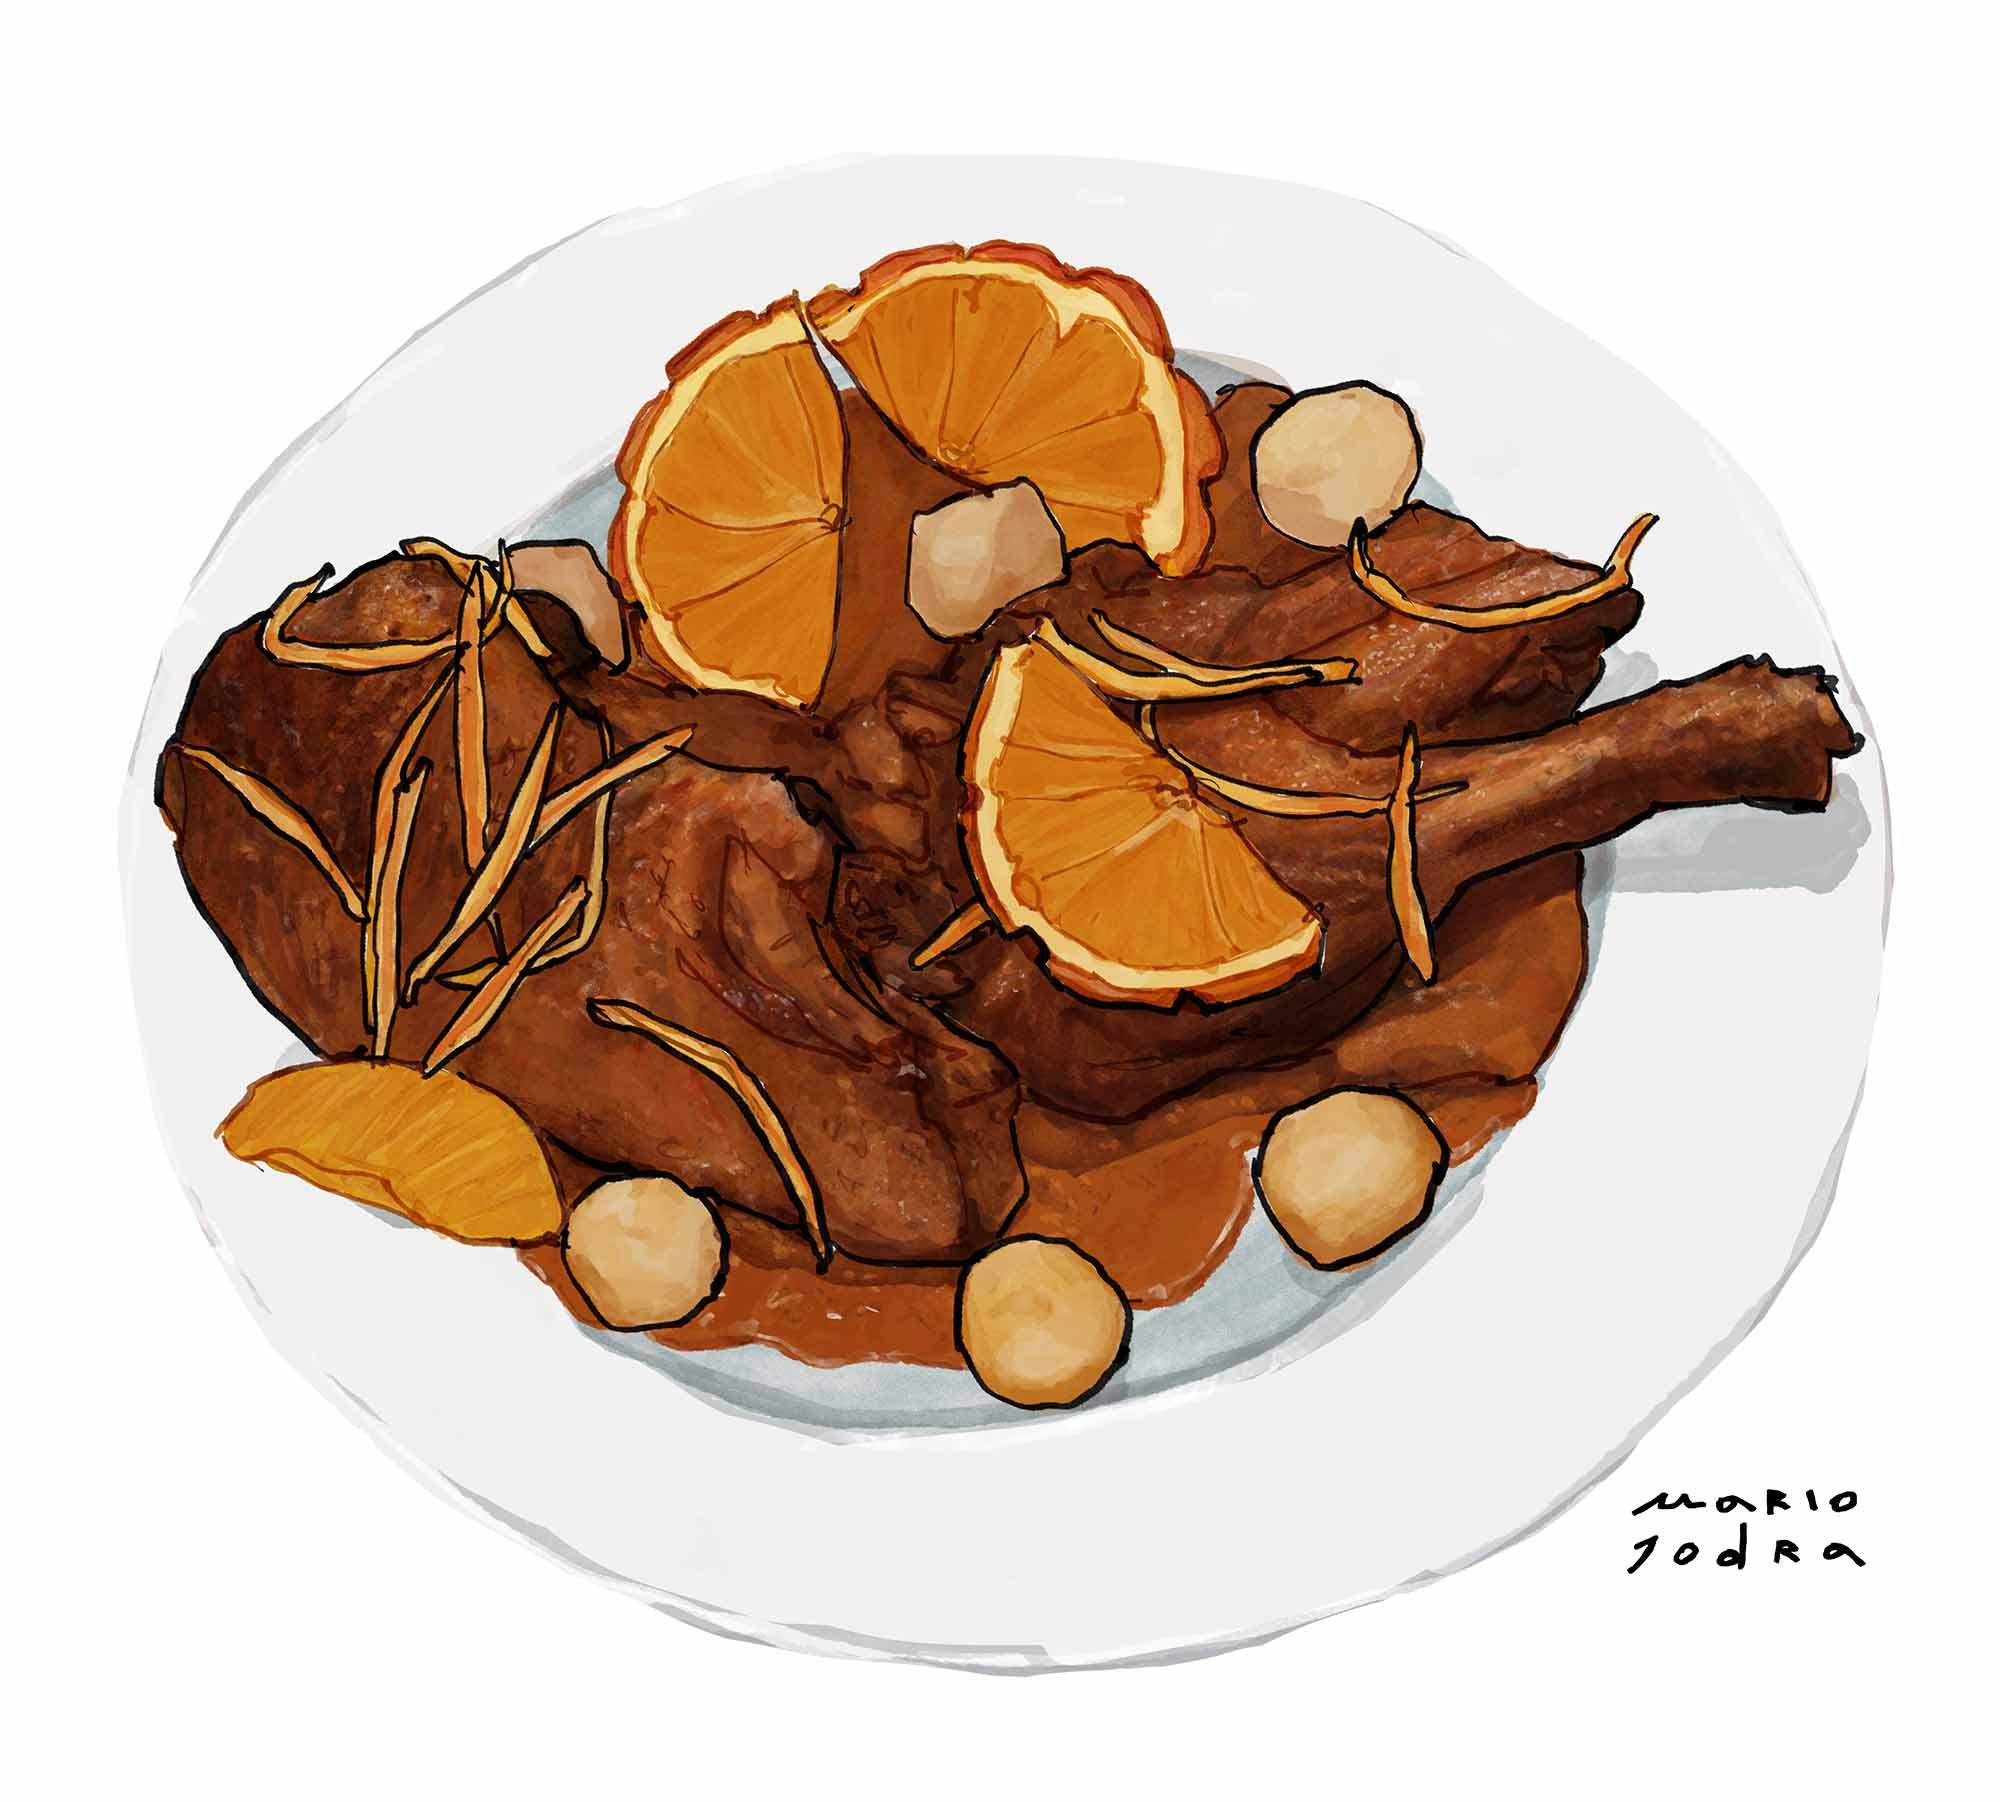 Mario Jodra illustration Art - Lhardy: Pato silvestre al perfume de naranja